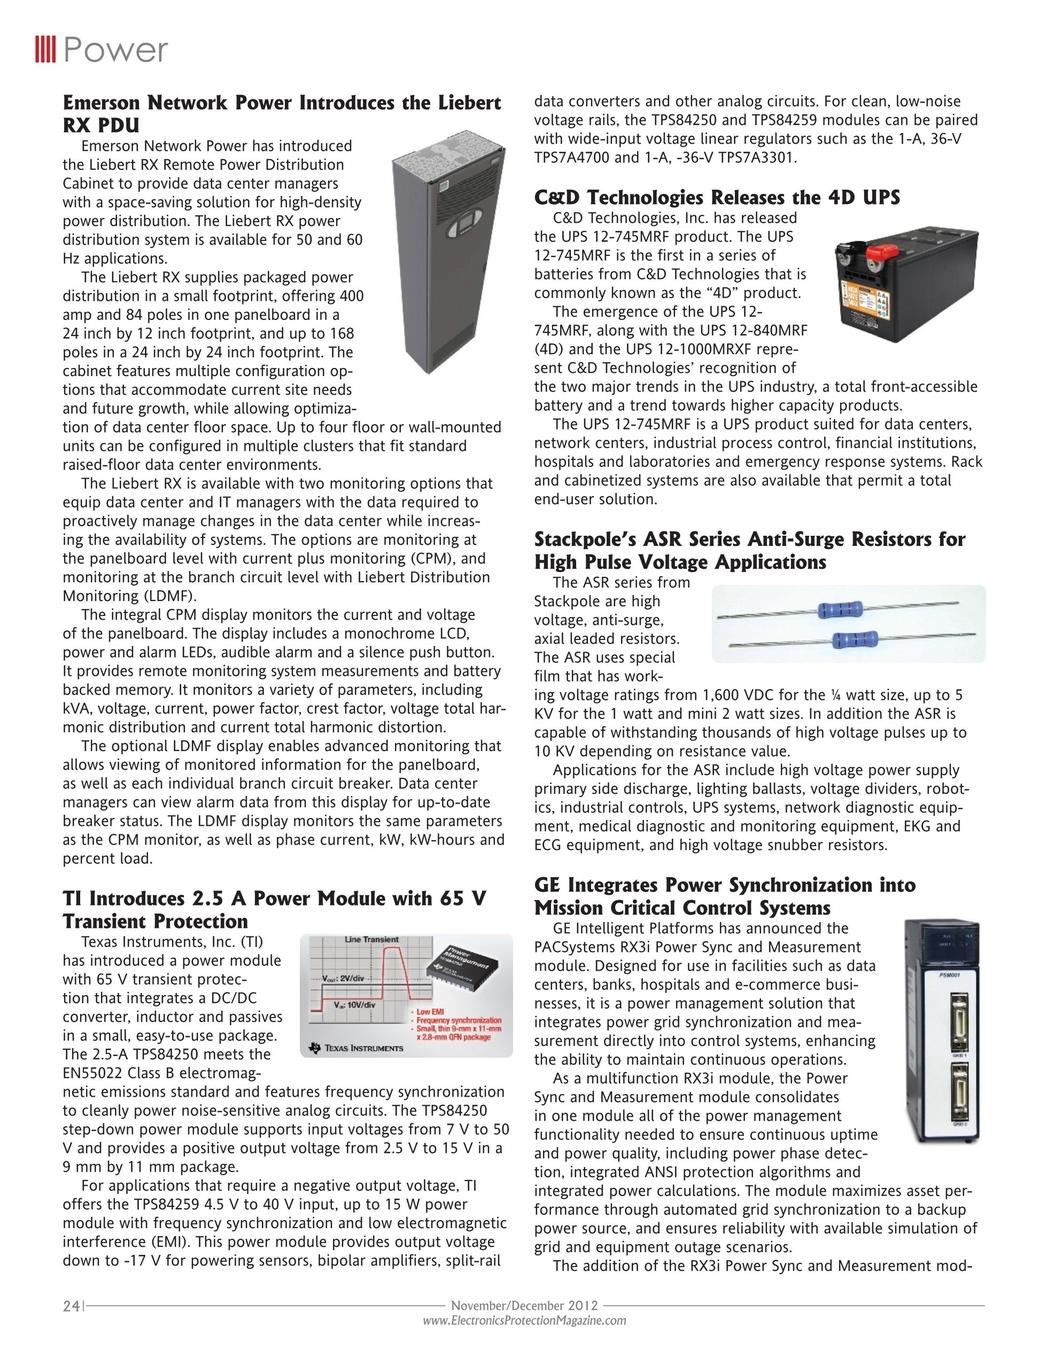 Electronics Protection November December 2012 36 Volt To 12 Converter Wiring Diagram